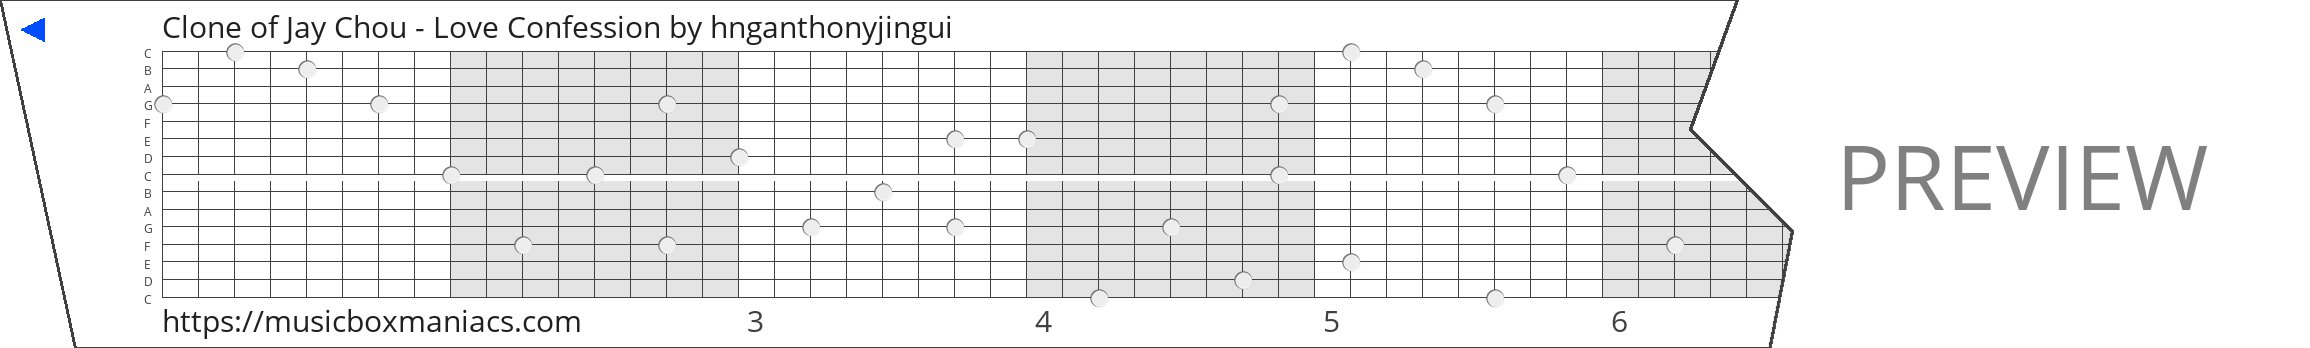 Clone of Jay Chou - Love Confession 15 note music box paper strip